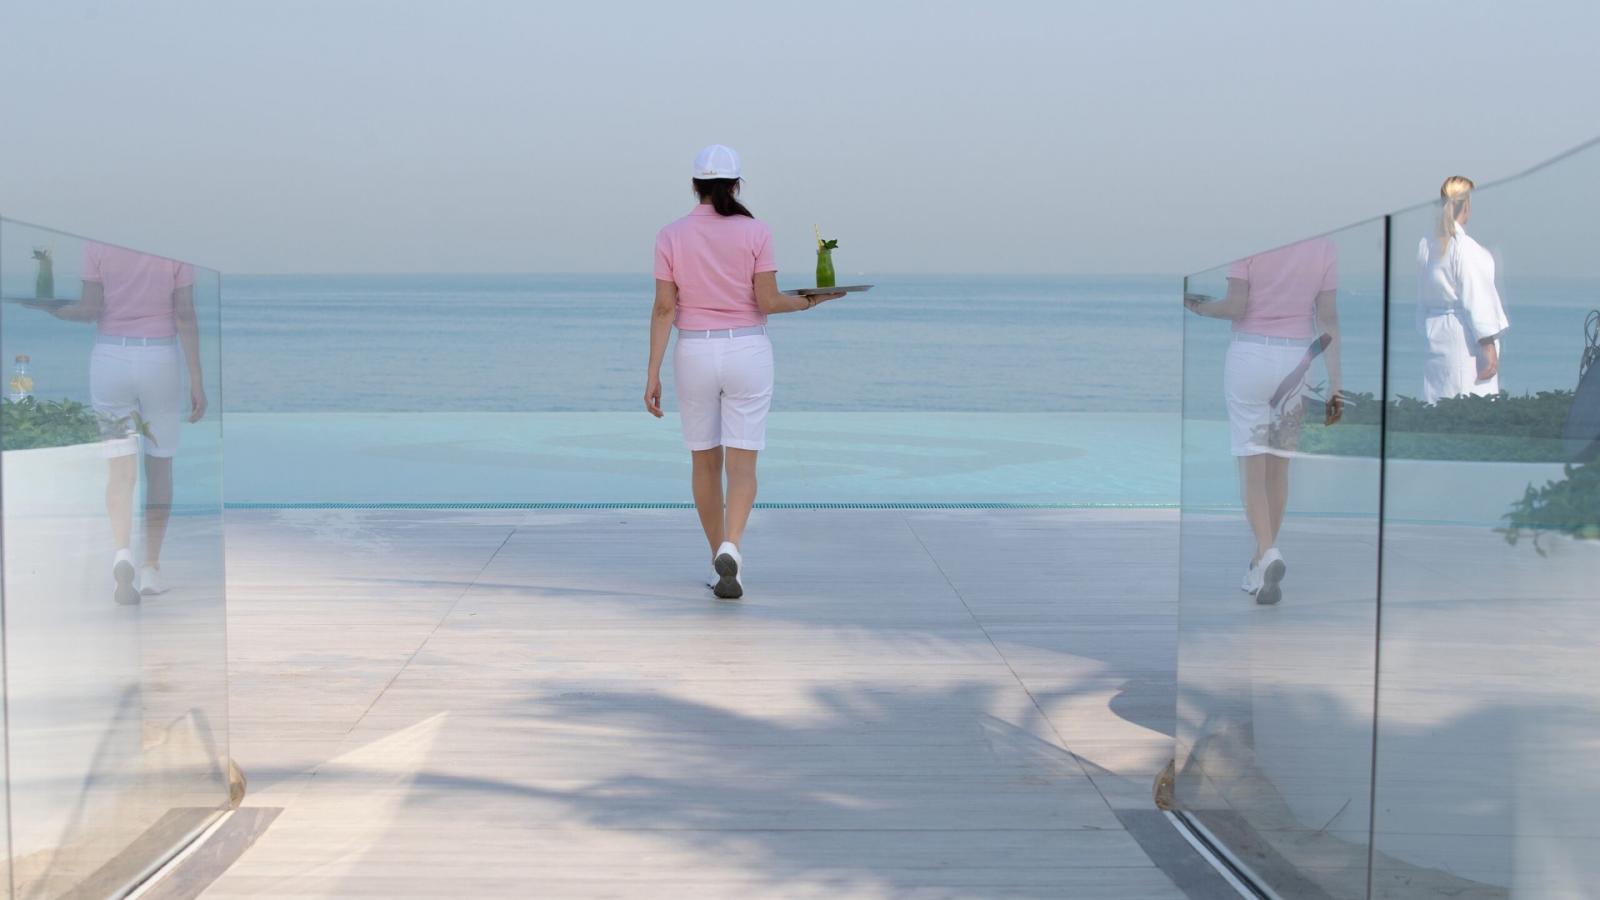 Trinkkuren: Foto vom Wellnesshotel Burj Al Arab Jumeirah | Wellness Dubai